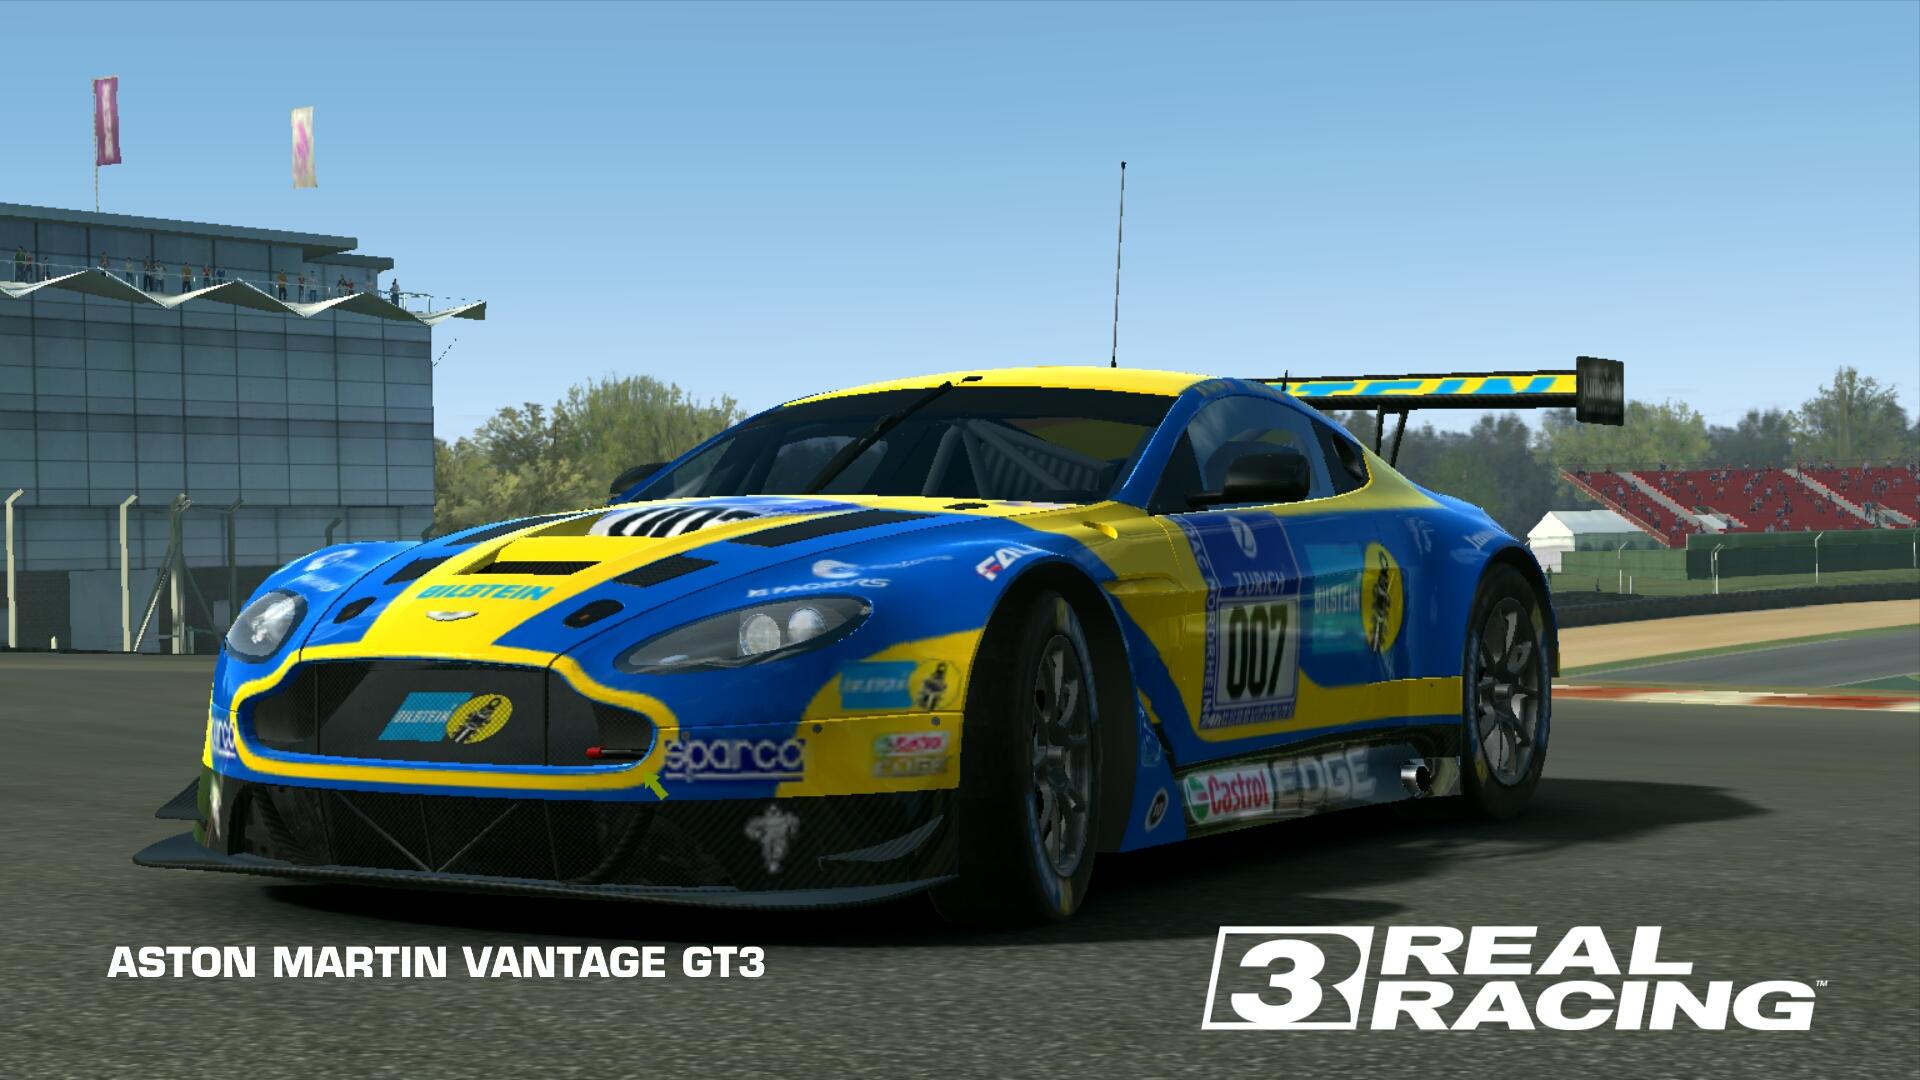 ASTON MARTIN VANTAGE GT Real Racing Wiki FANDOM Powered By Wikia - Aston martin wiki